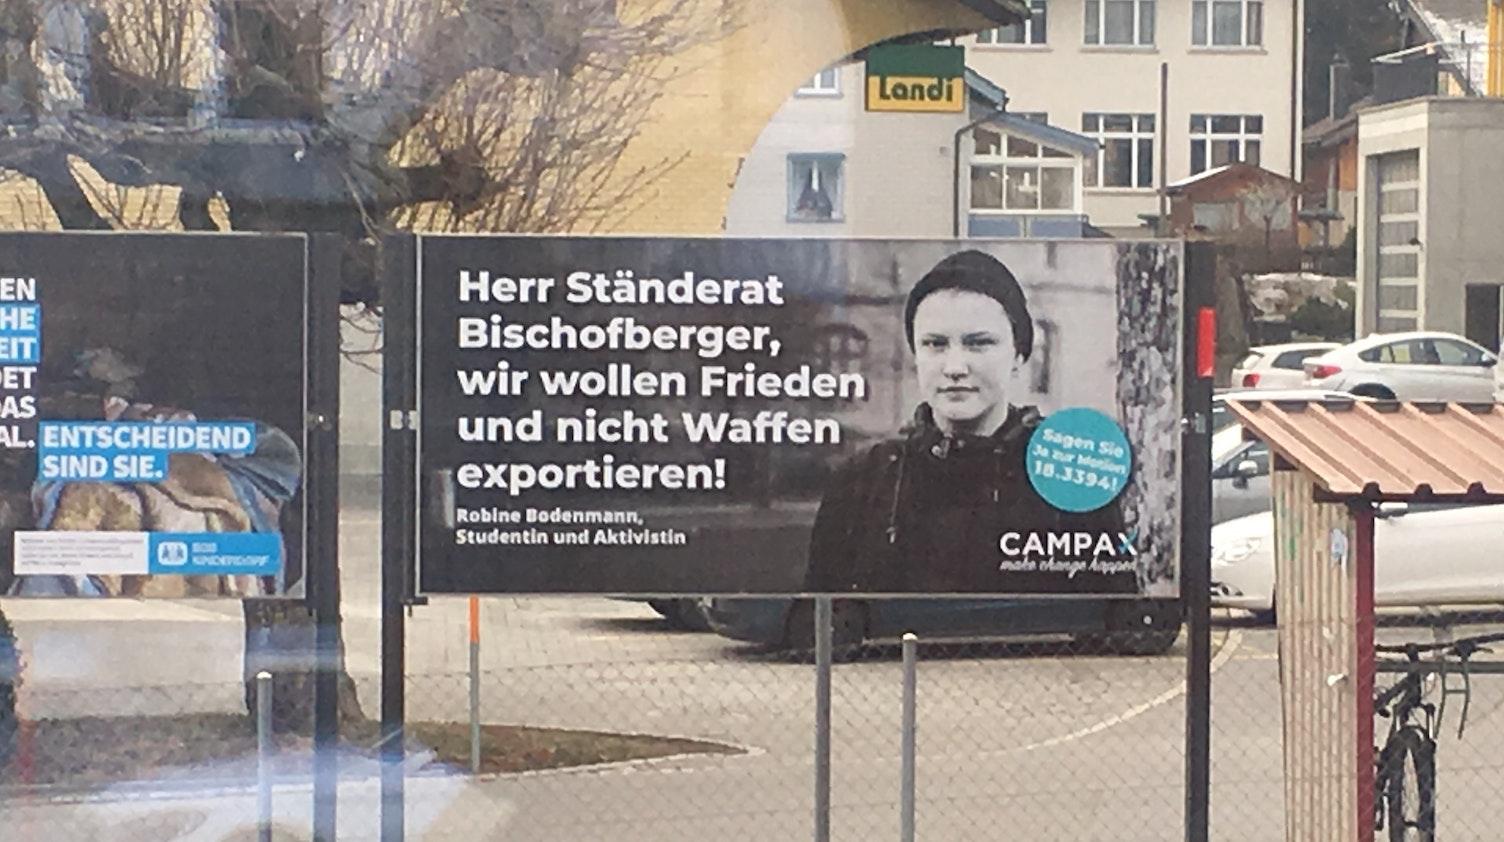 Kampagne